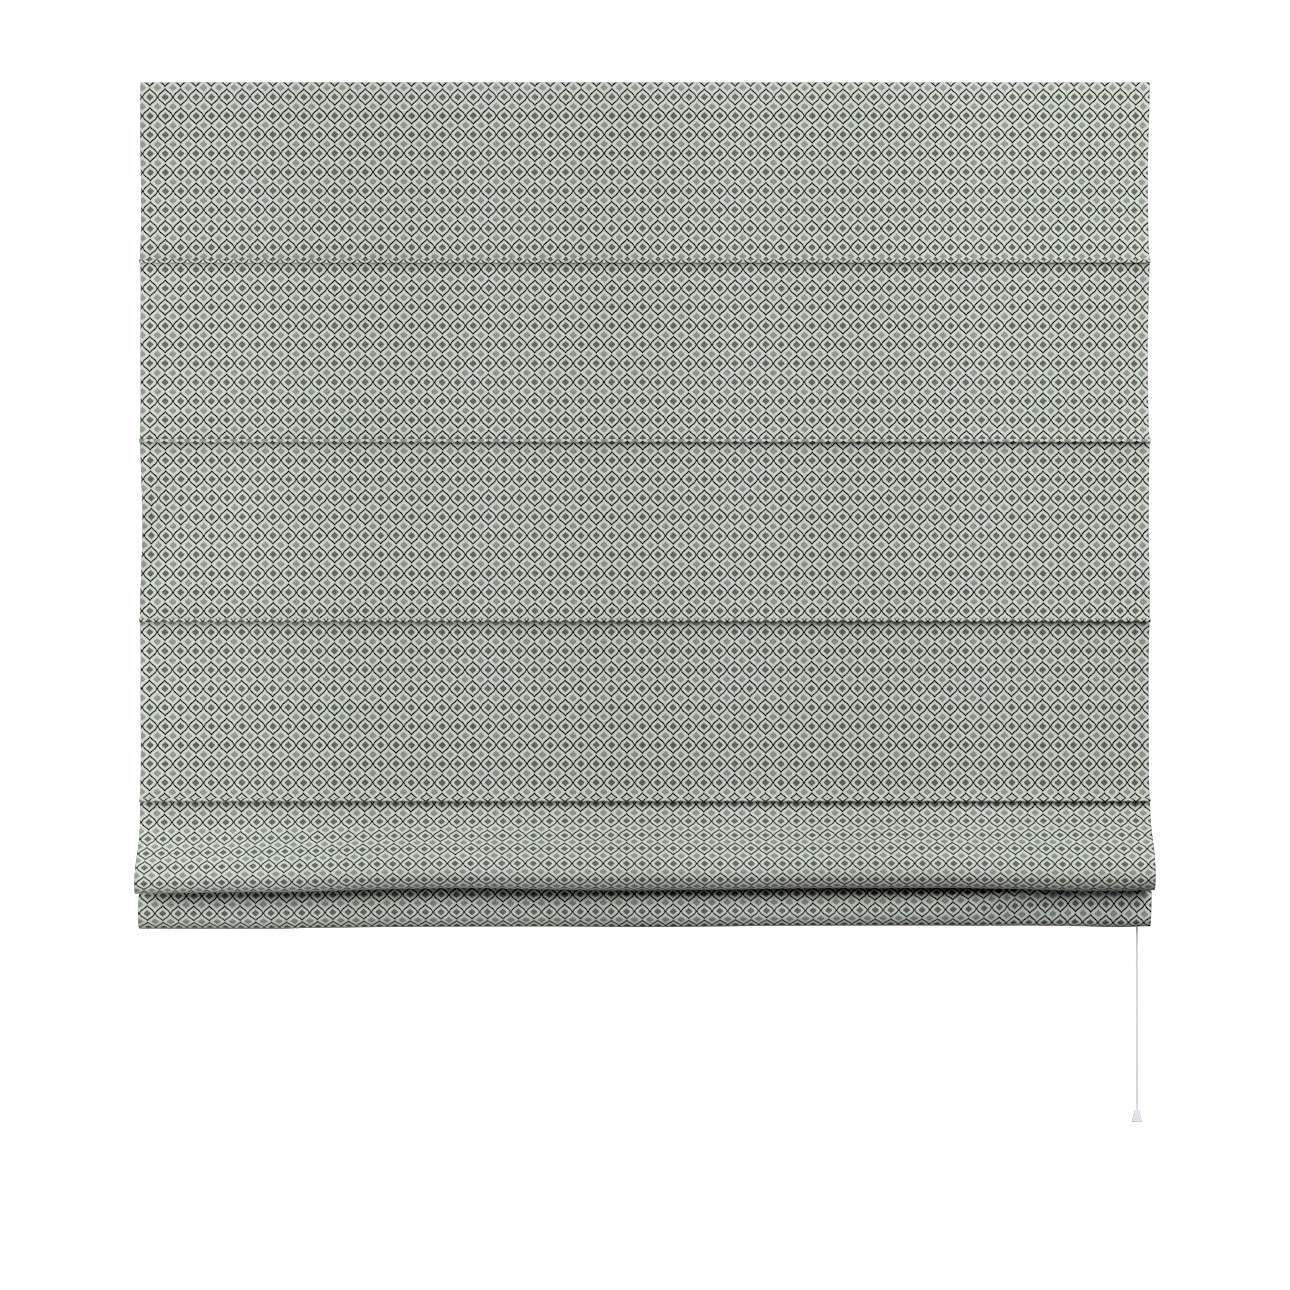 Capri roman blind in collection Black & White, fabric: 142-76